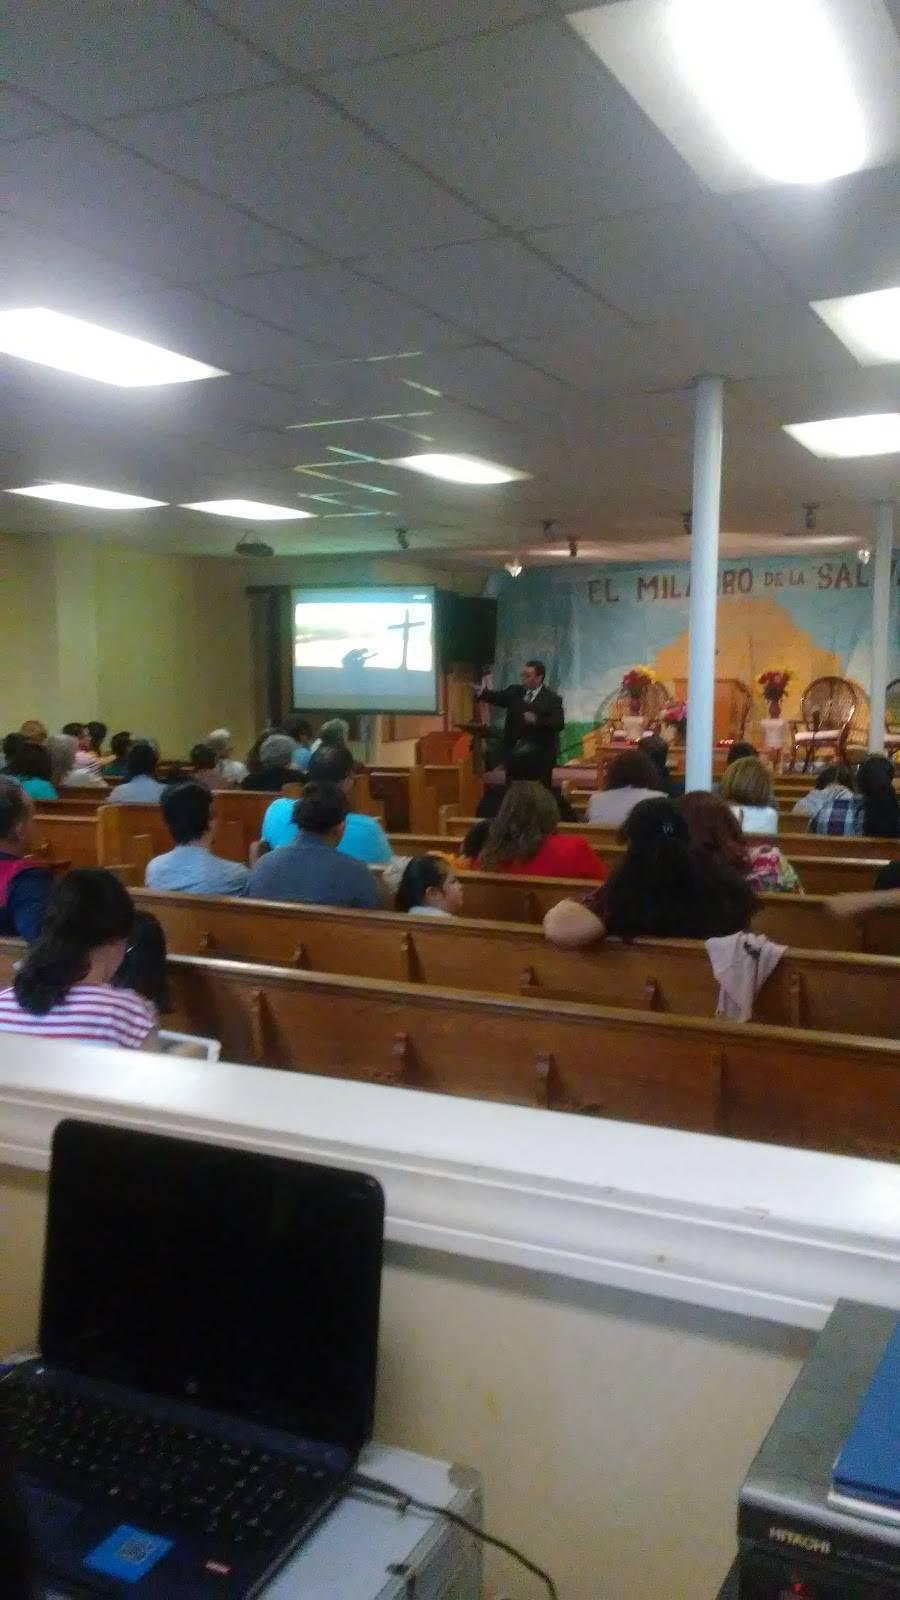 Detroit Cavalry Spanish SDA Church - church  | Photo 7 of 10 | Address: 1227 Cavalry St, Detroit, MI 48209, USA | Phone: (313) 842-2730